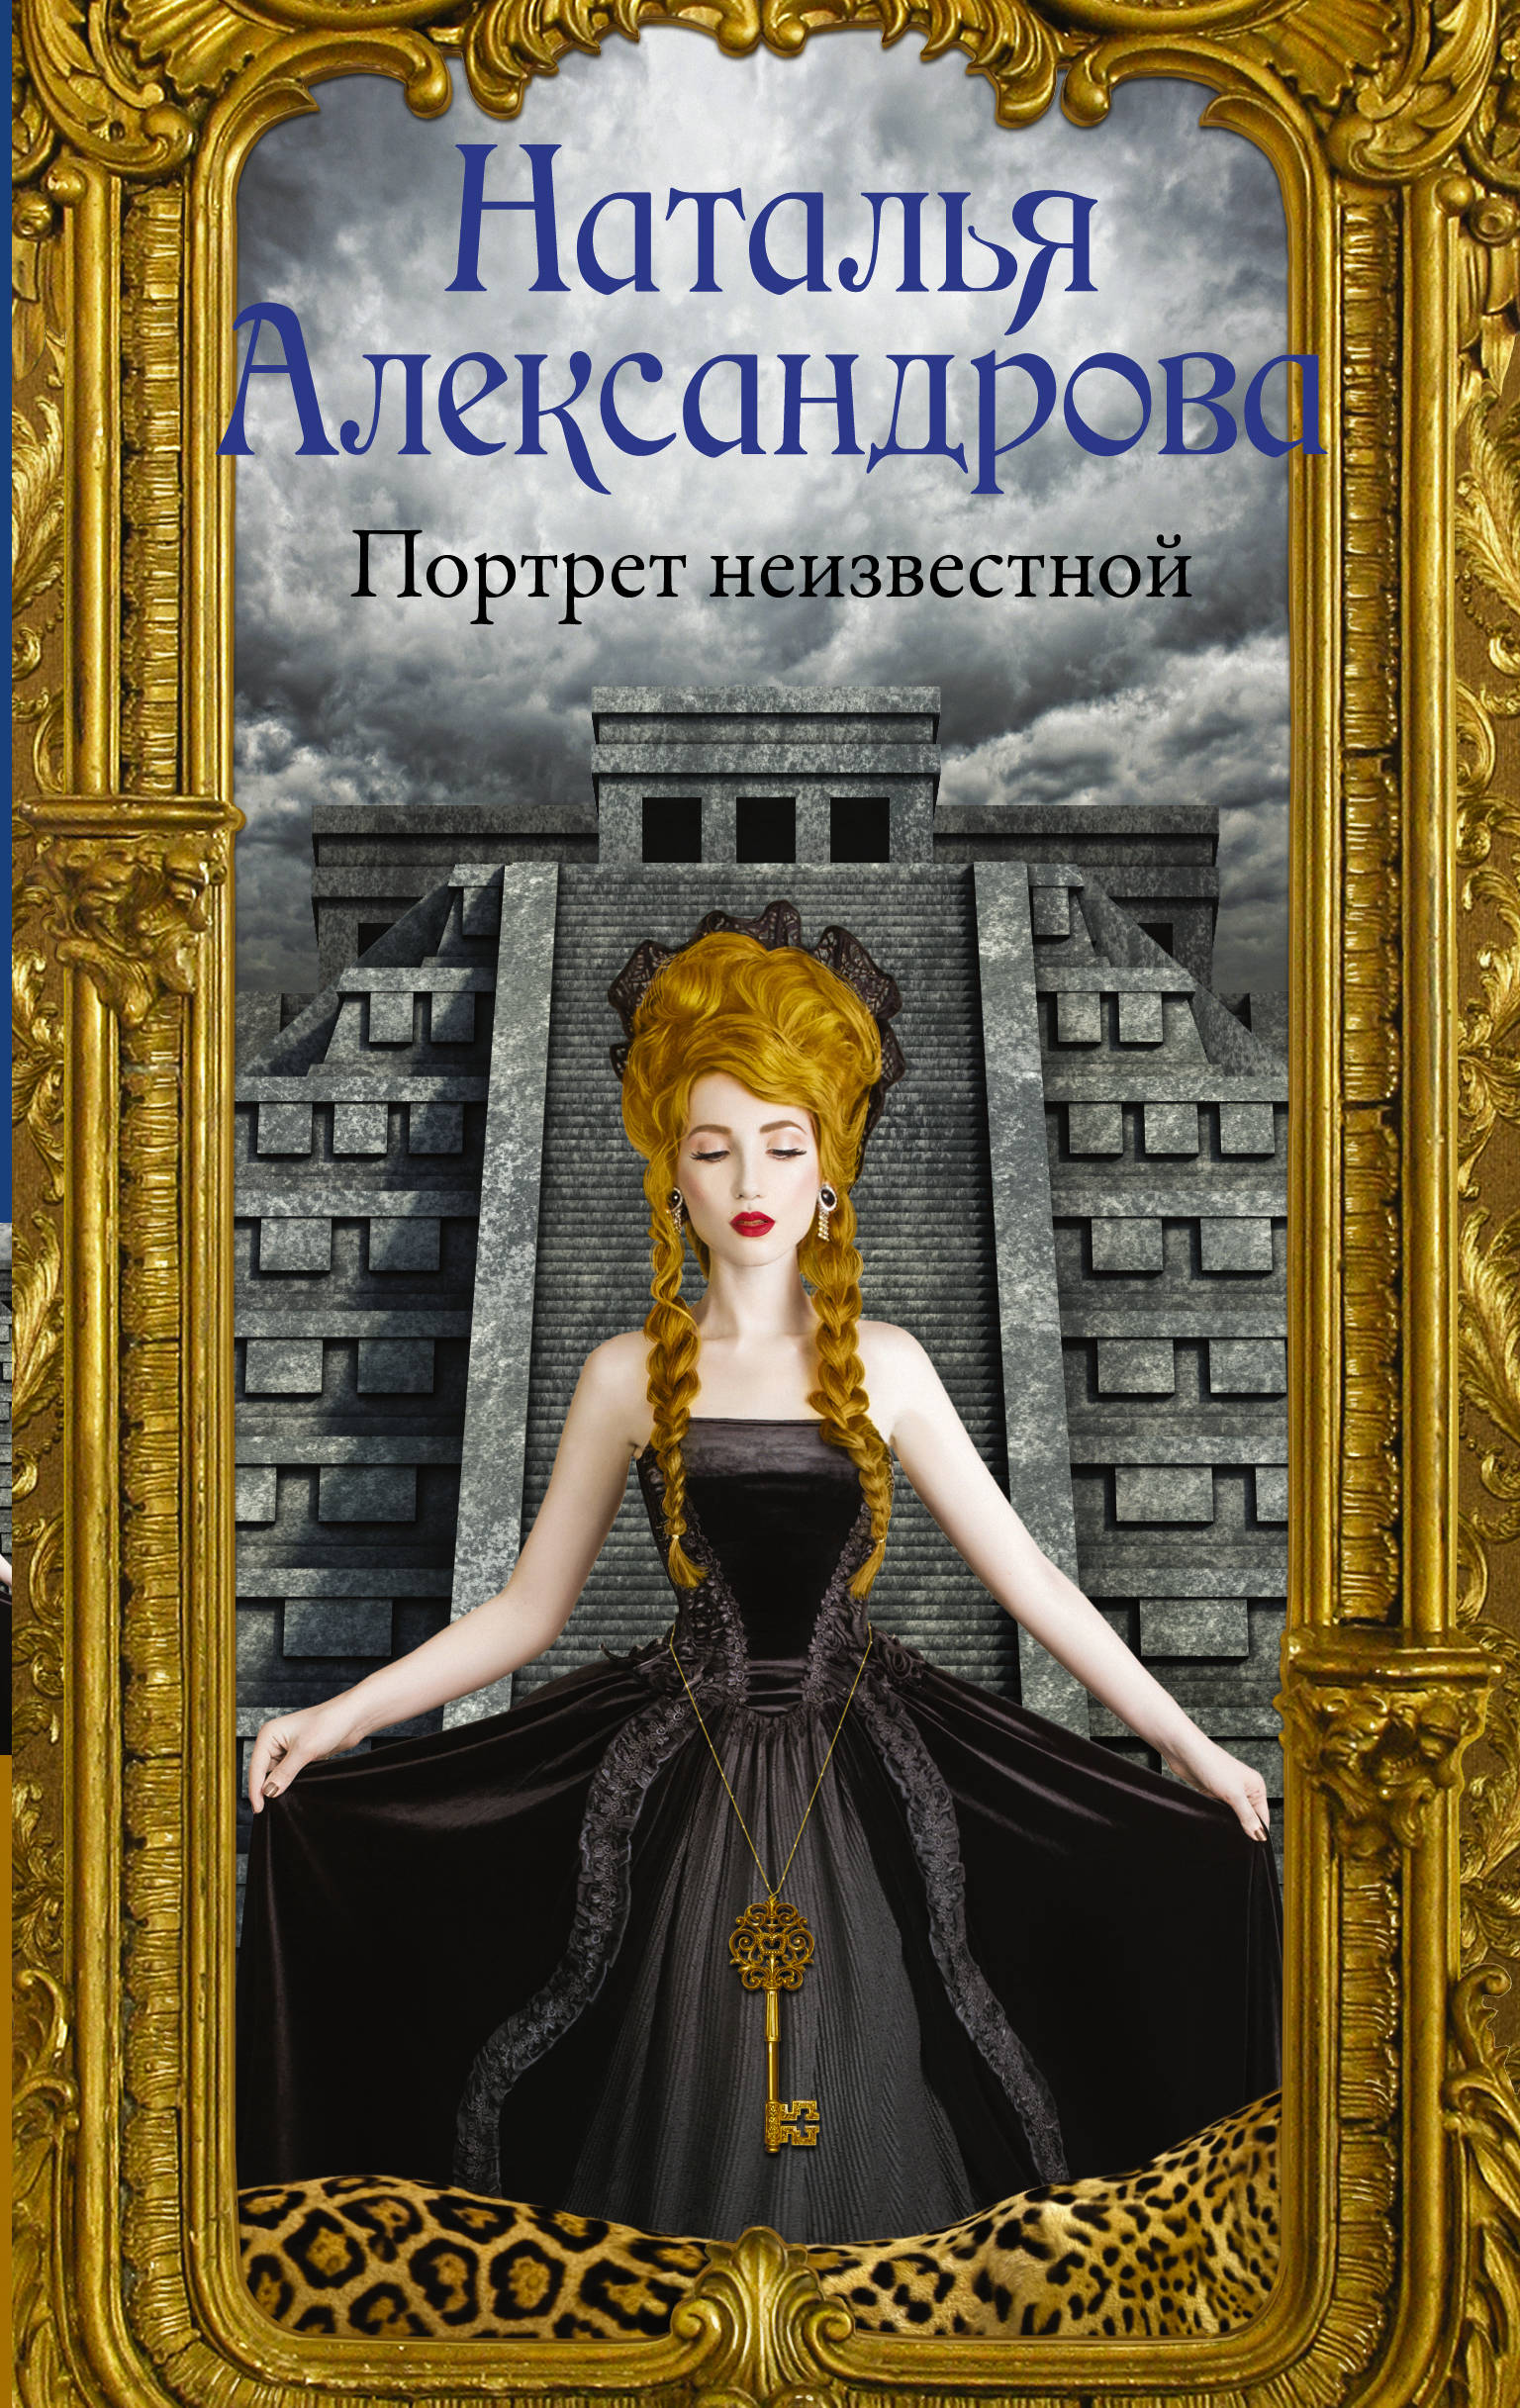 Н. Н. Александрова Портрет неизвестной